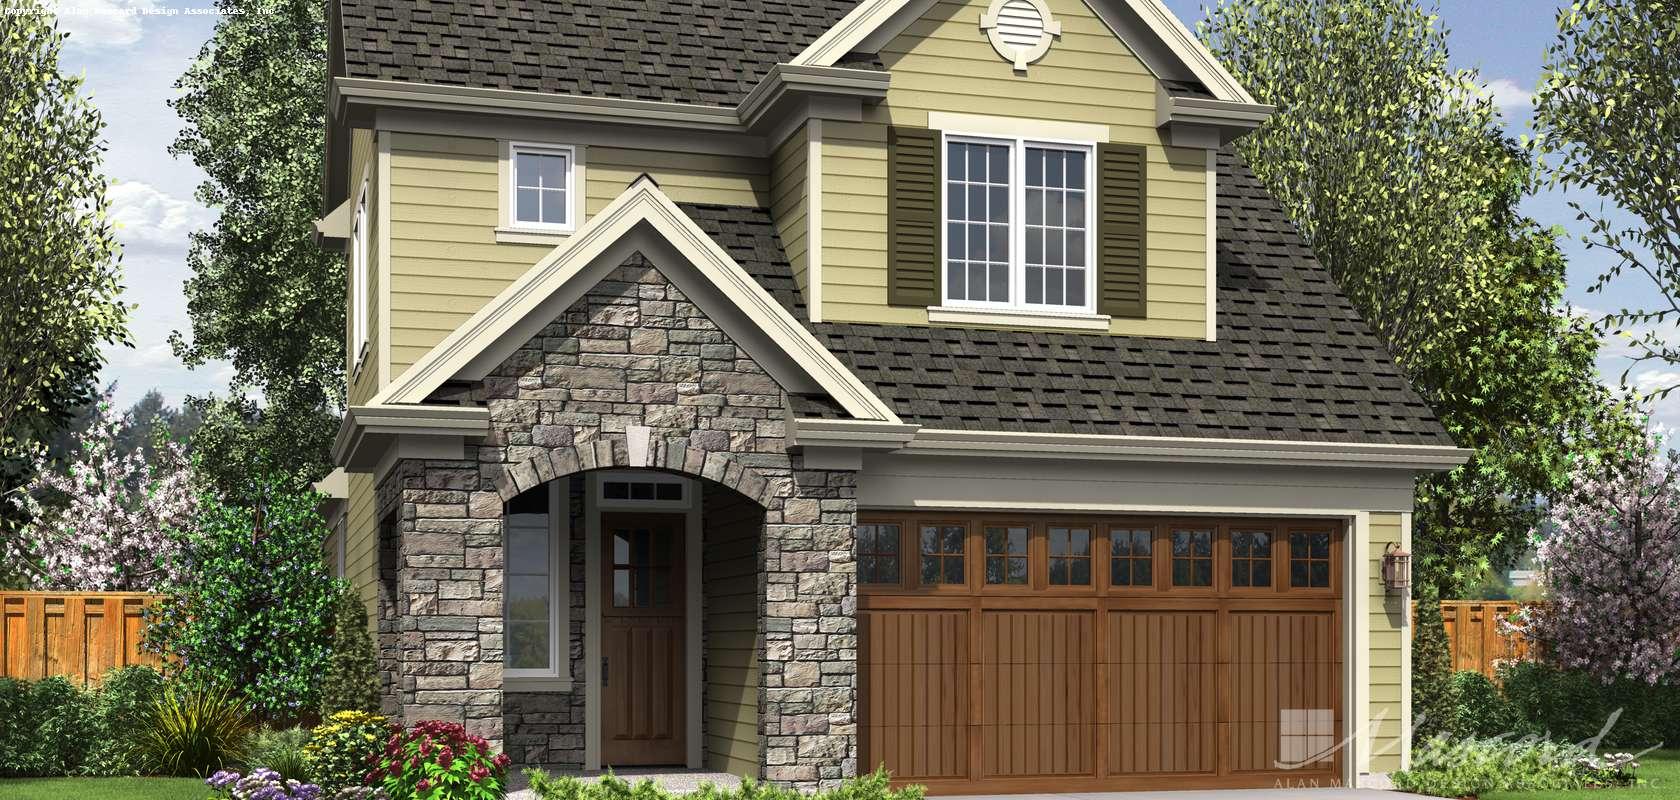 Mascord House Plan 21144: The Barberton